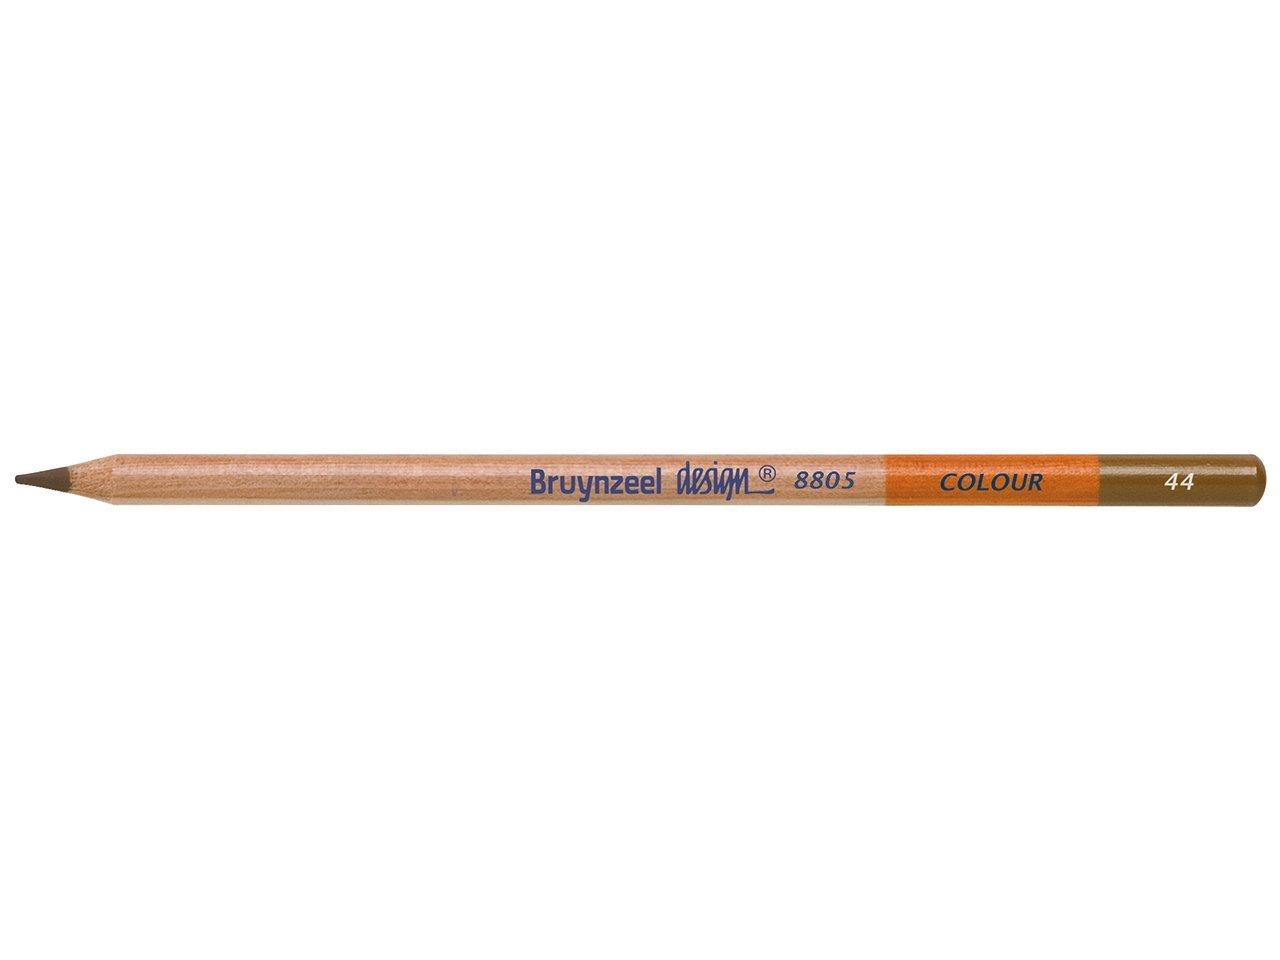 Bruynzeel Pencil - 44 Mid Brown